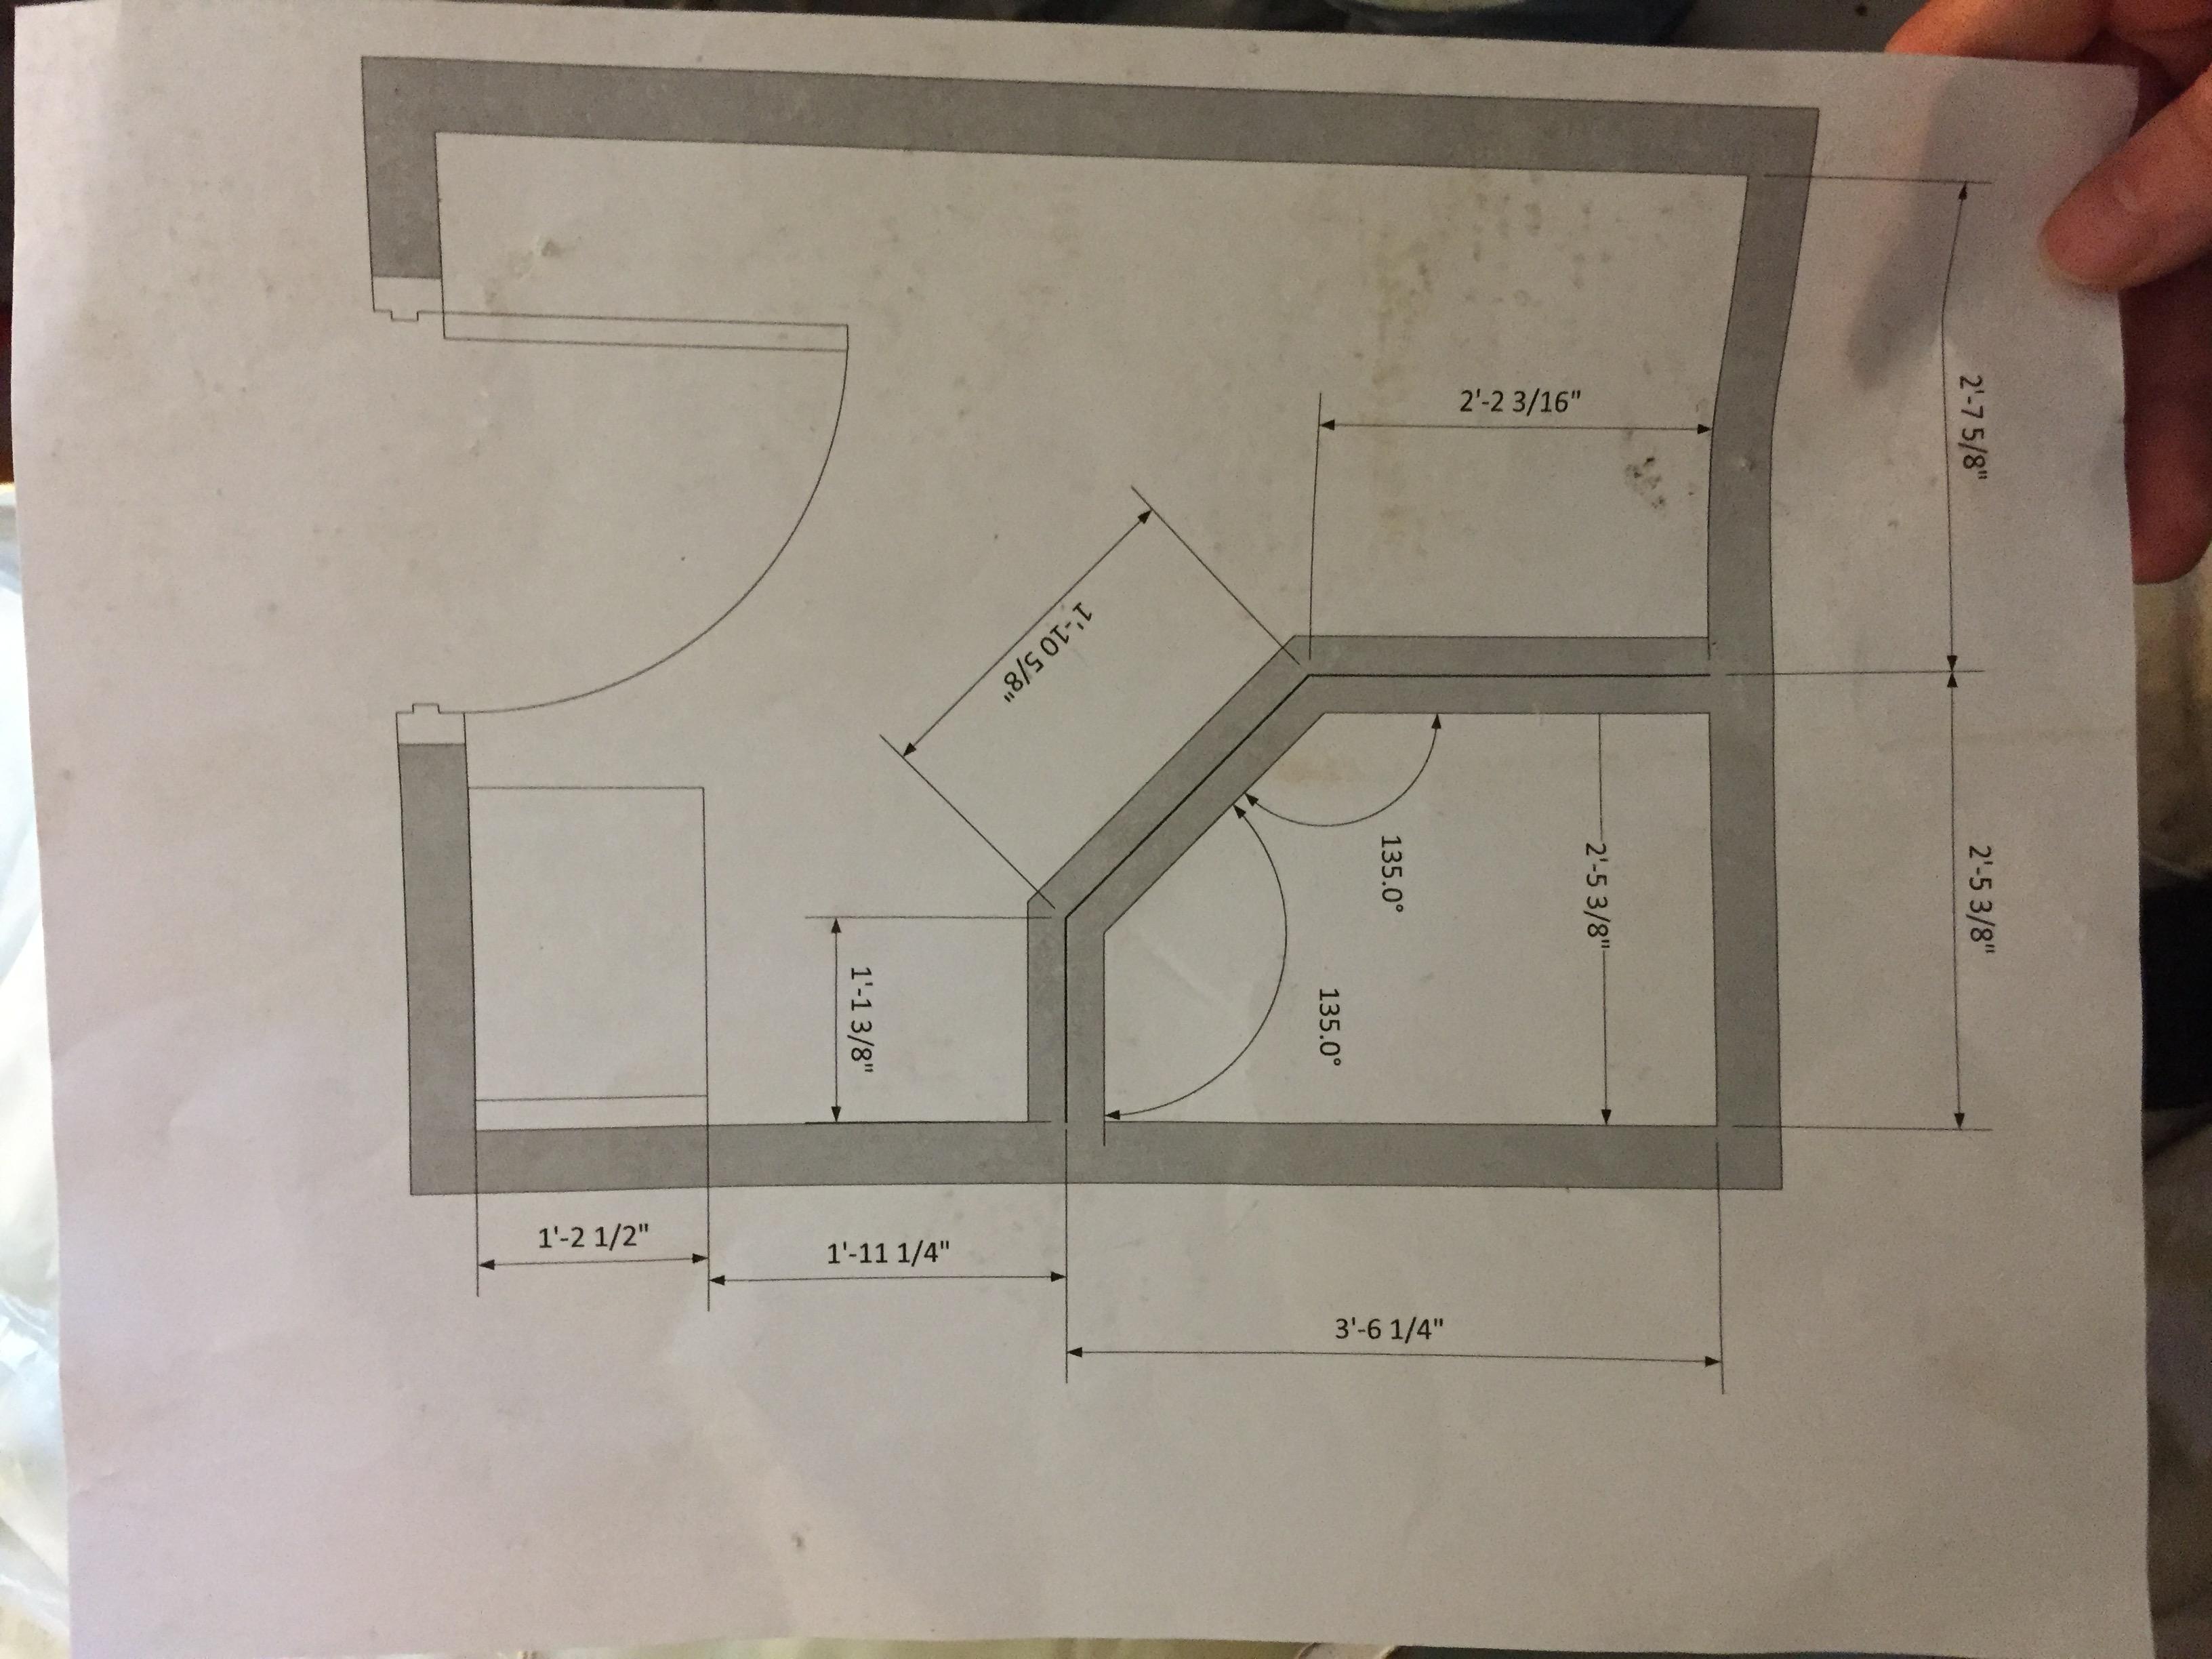 McLean Bath Remodel 2- The Plan